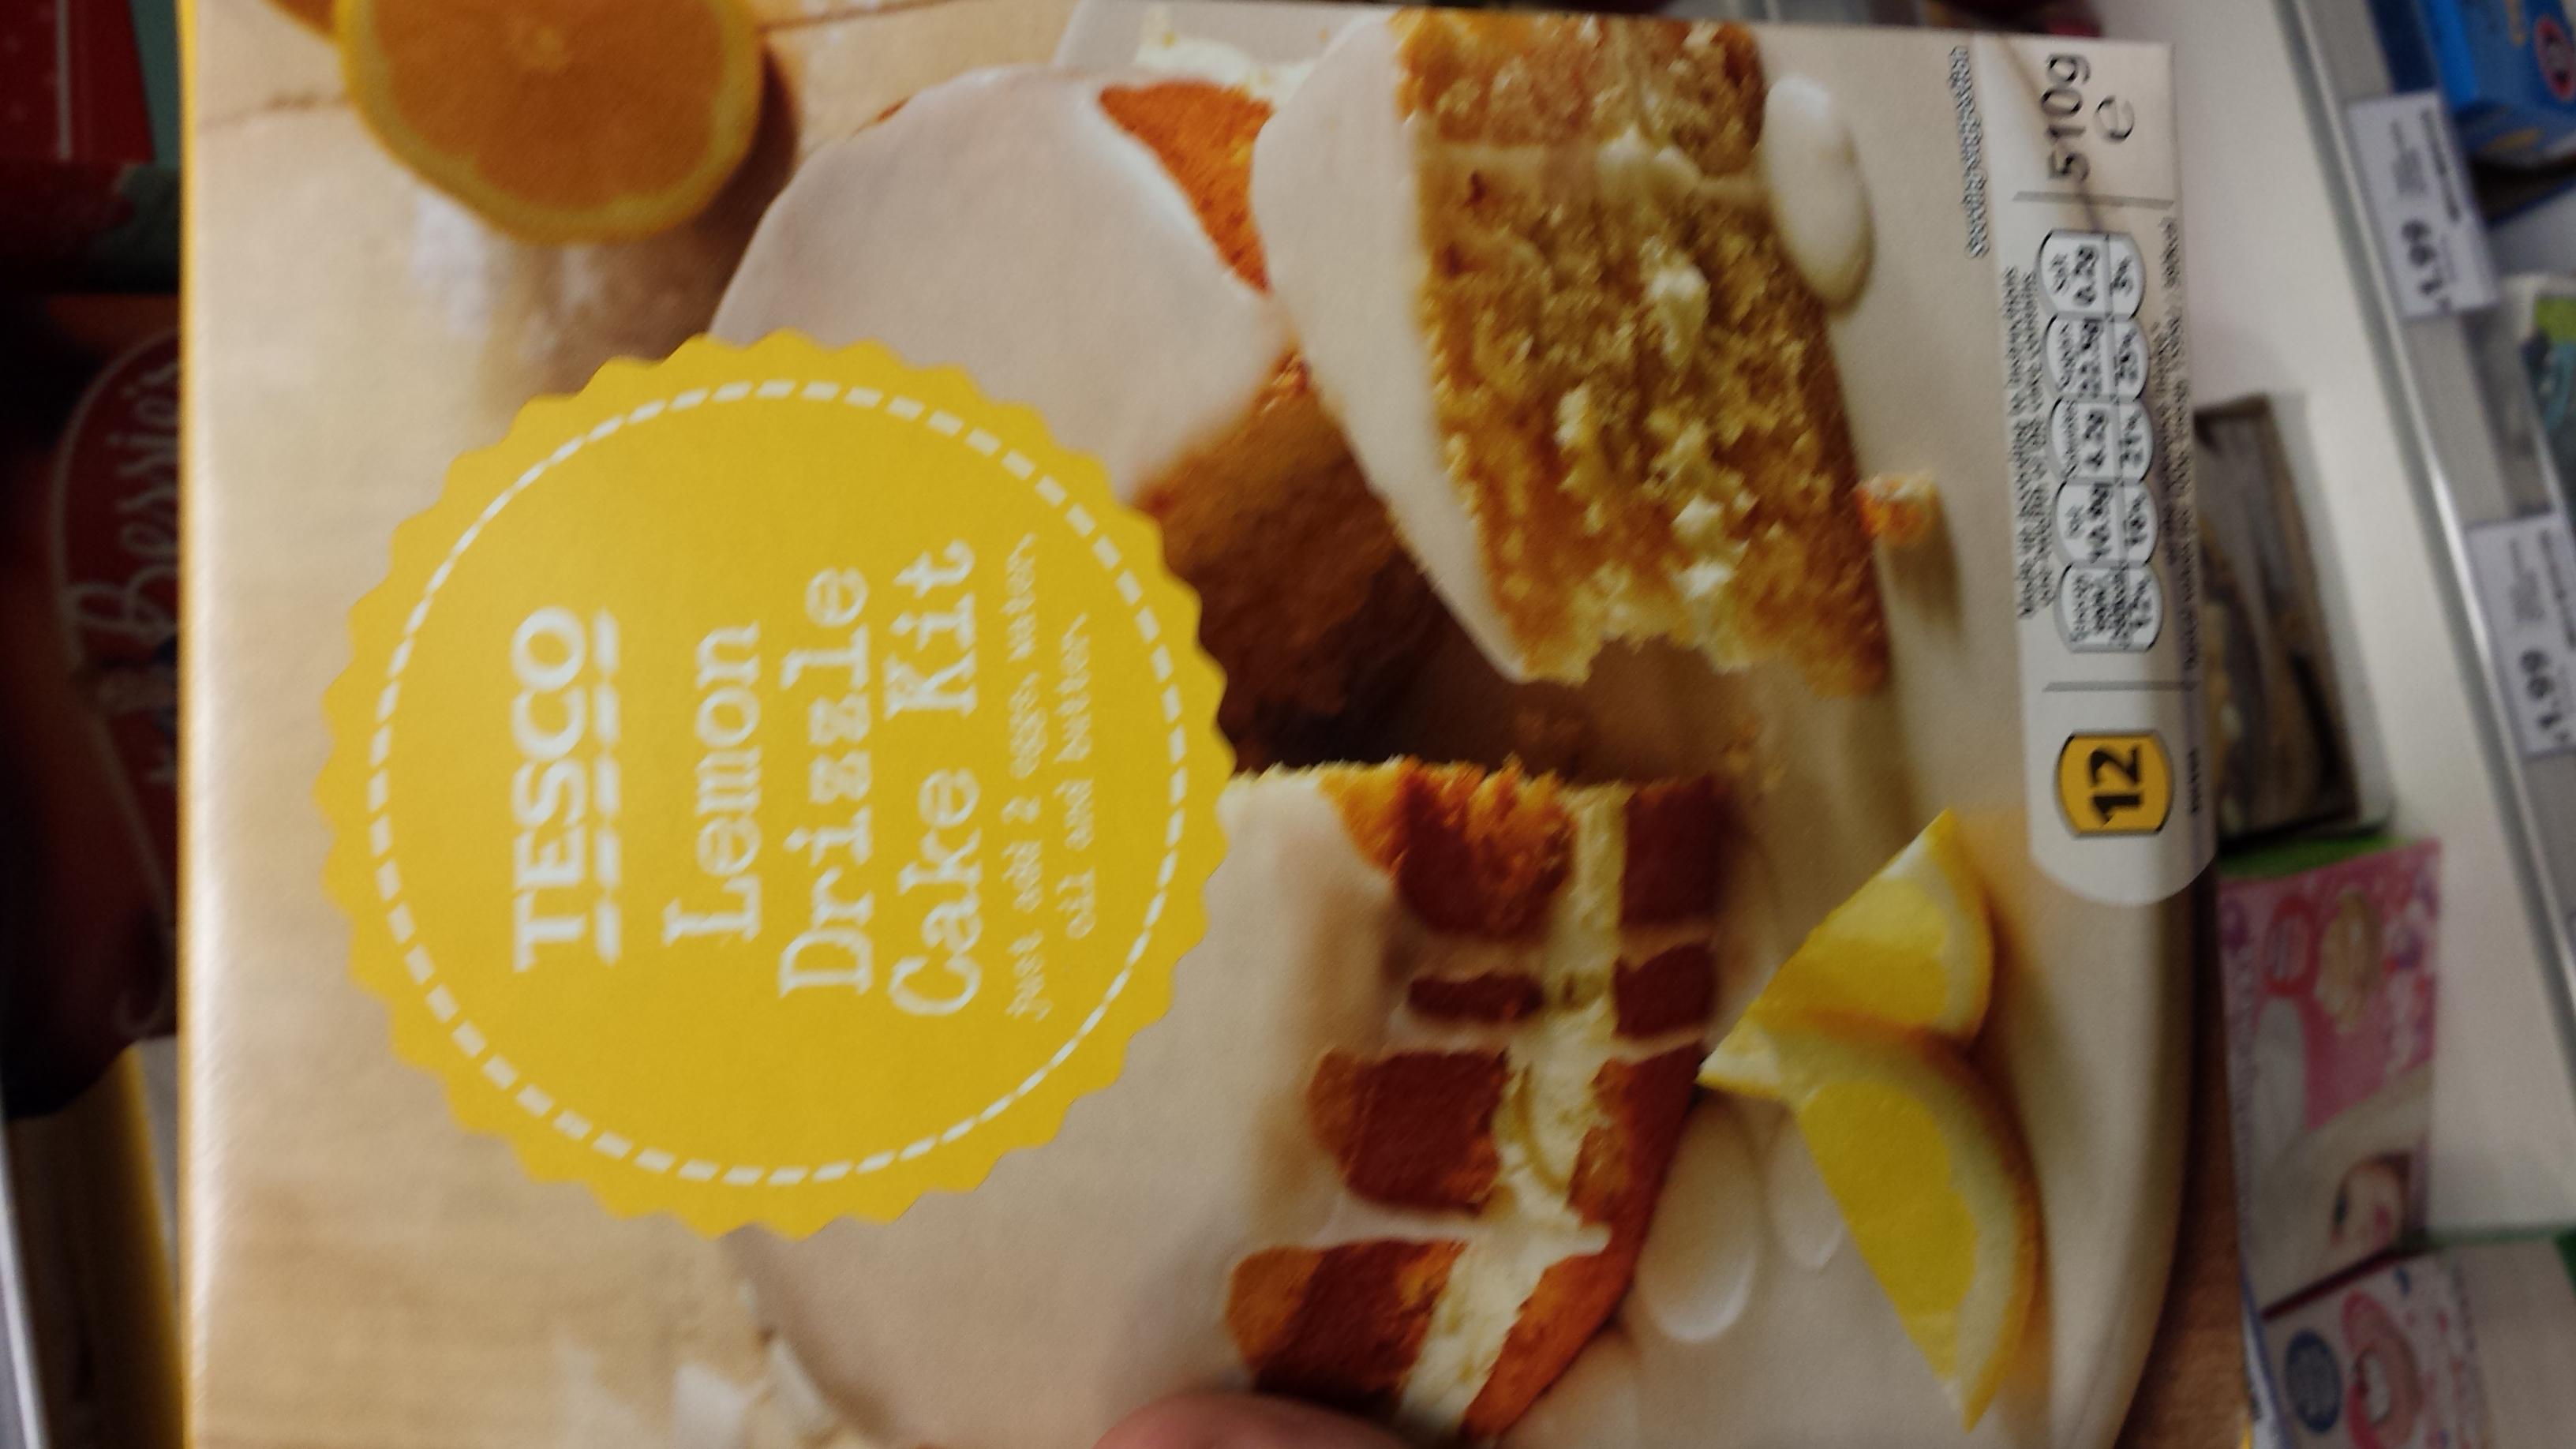 Tesco Cake Recipes Uk: 11 Lactose And Dairy Free Baking Kits -I Hate You Milk